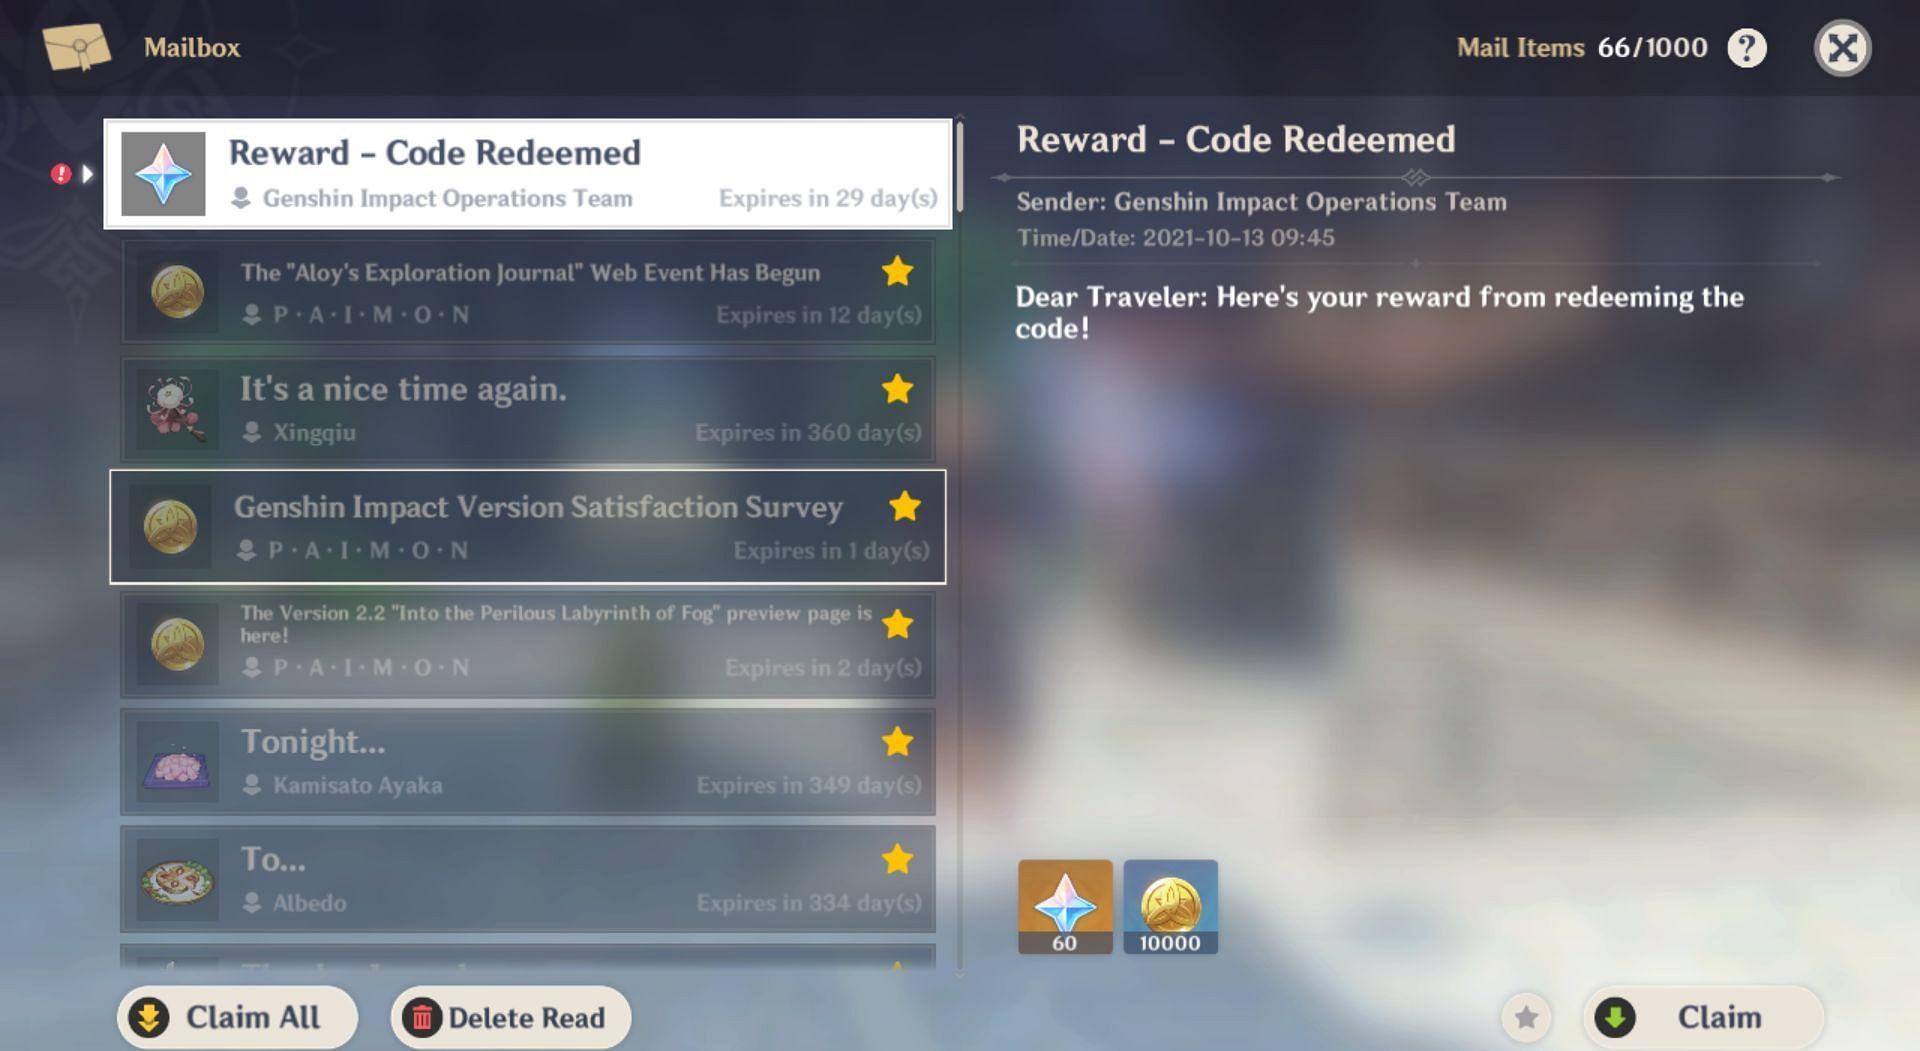 New redeem code rewards in the mail (Image via Genshin Impact)